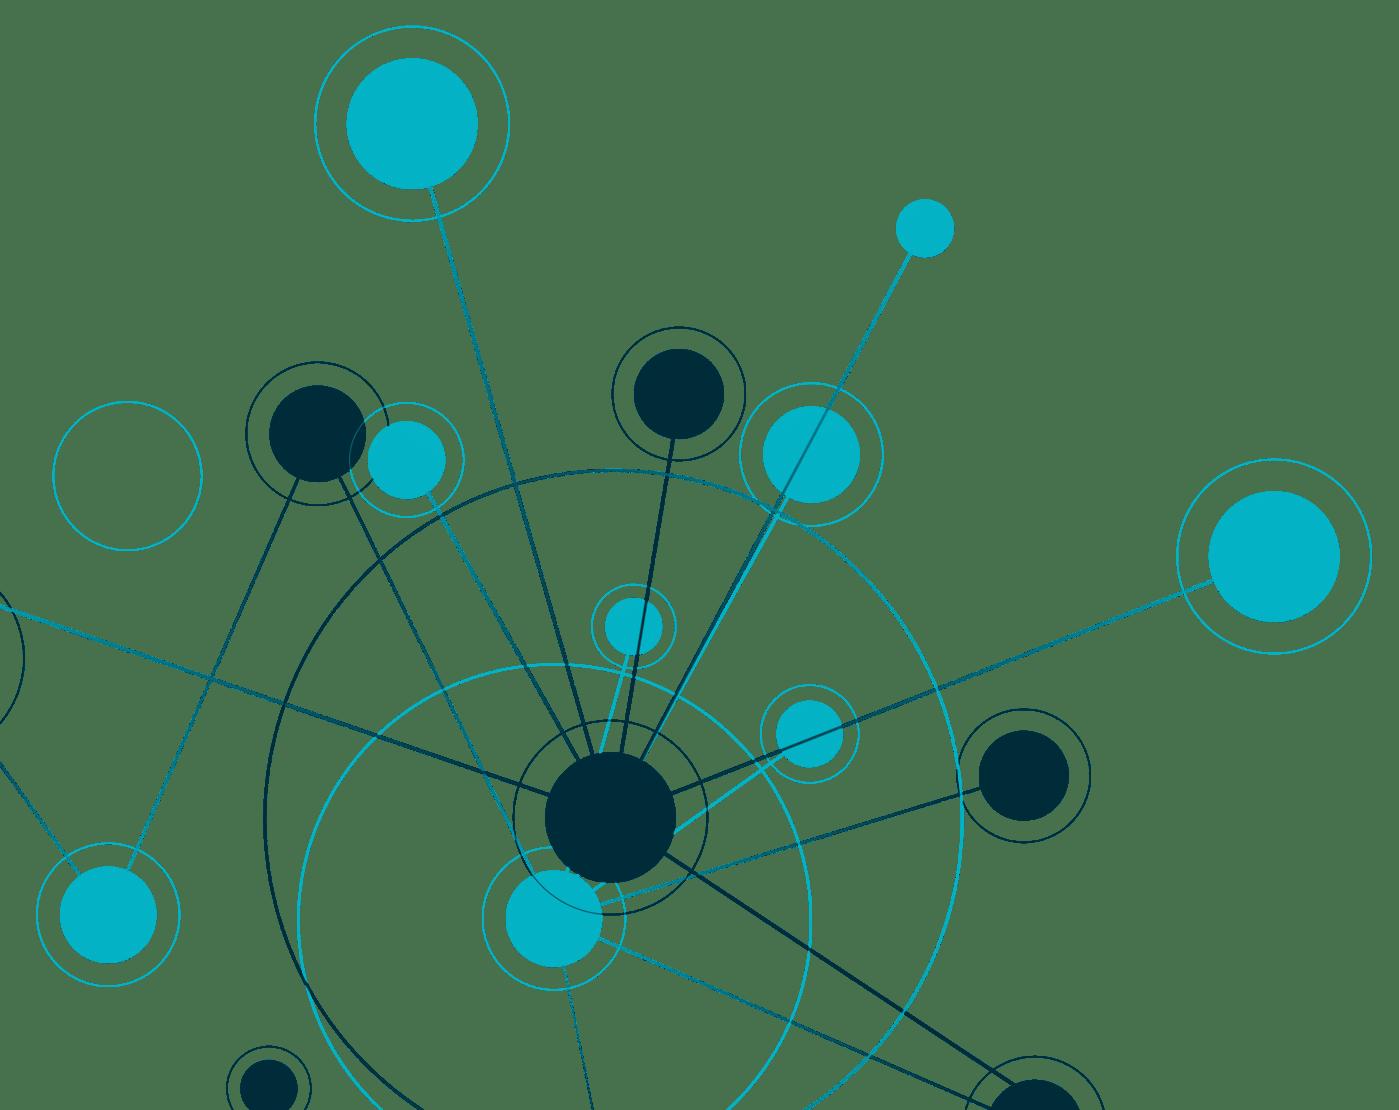 Nextech Announces New Remote Management & Virtual Care Products